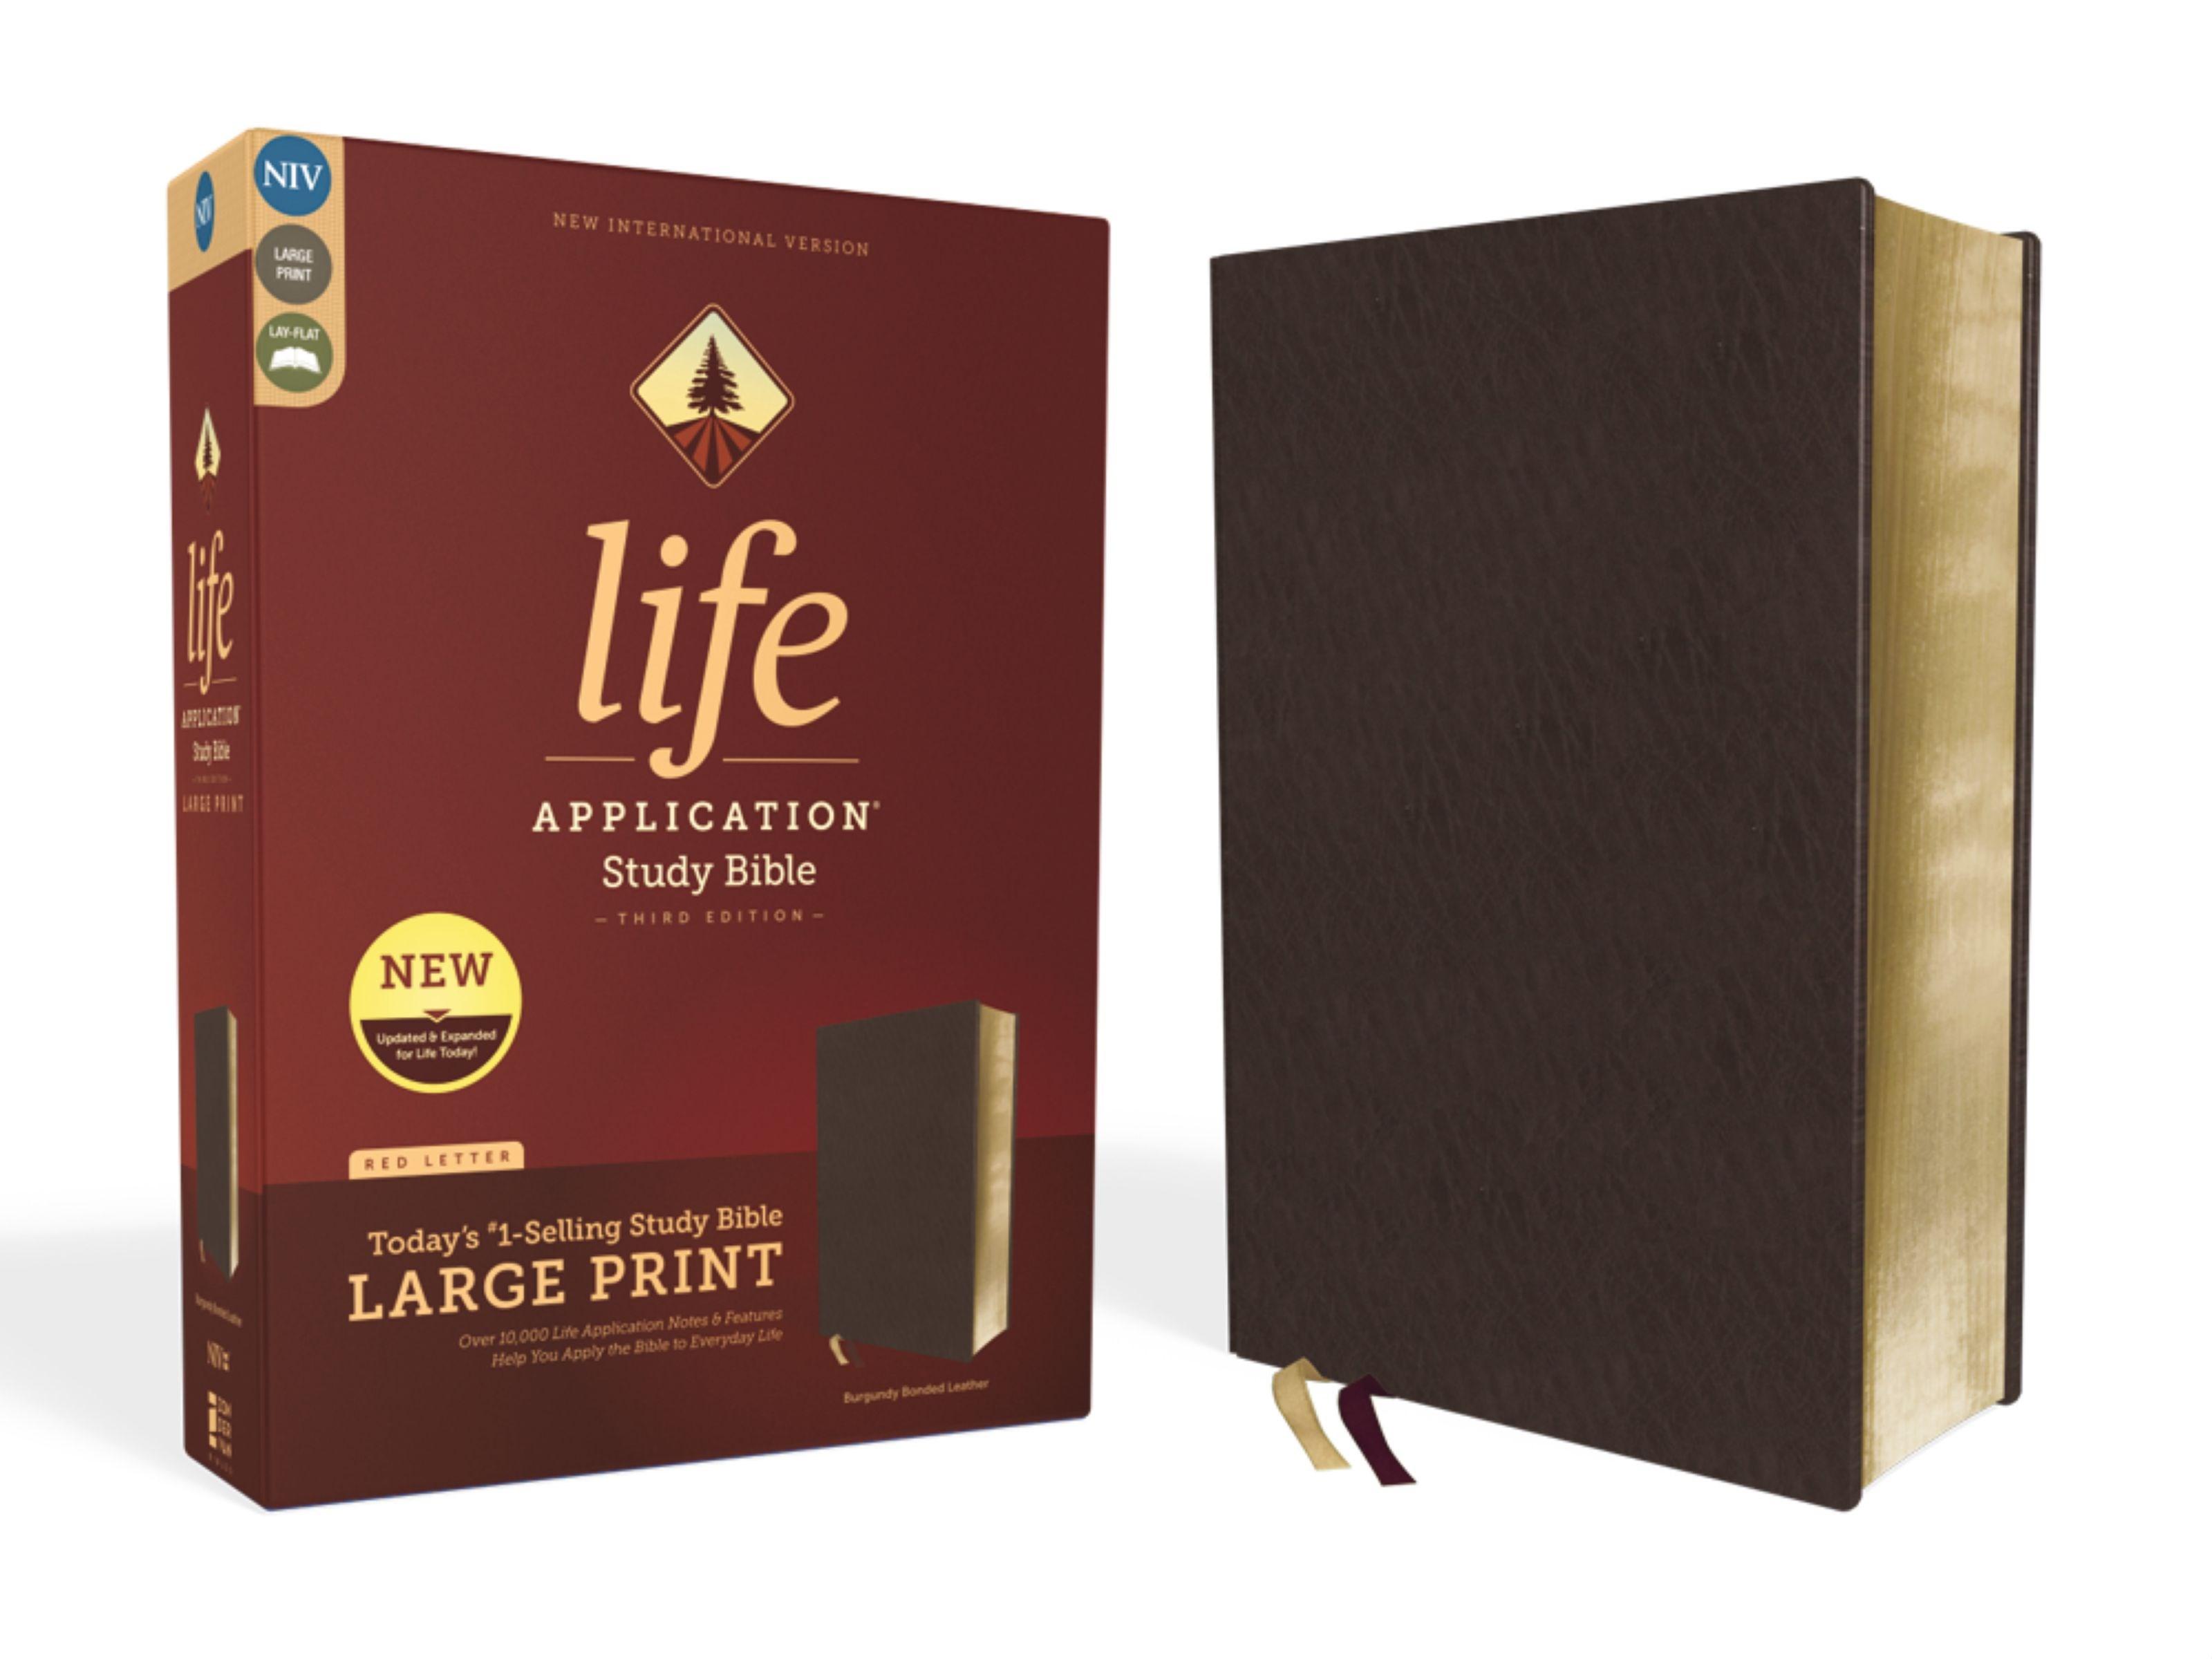 NIV Life Application Study Bible/Large Print (Third Edition)-Burgundy Bonded Leather